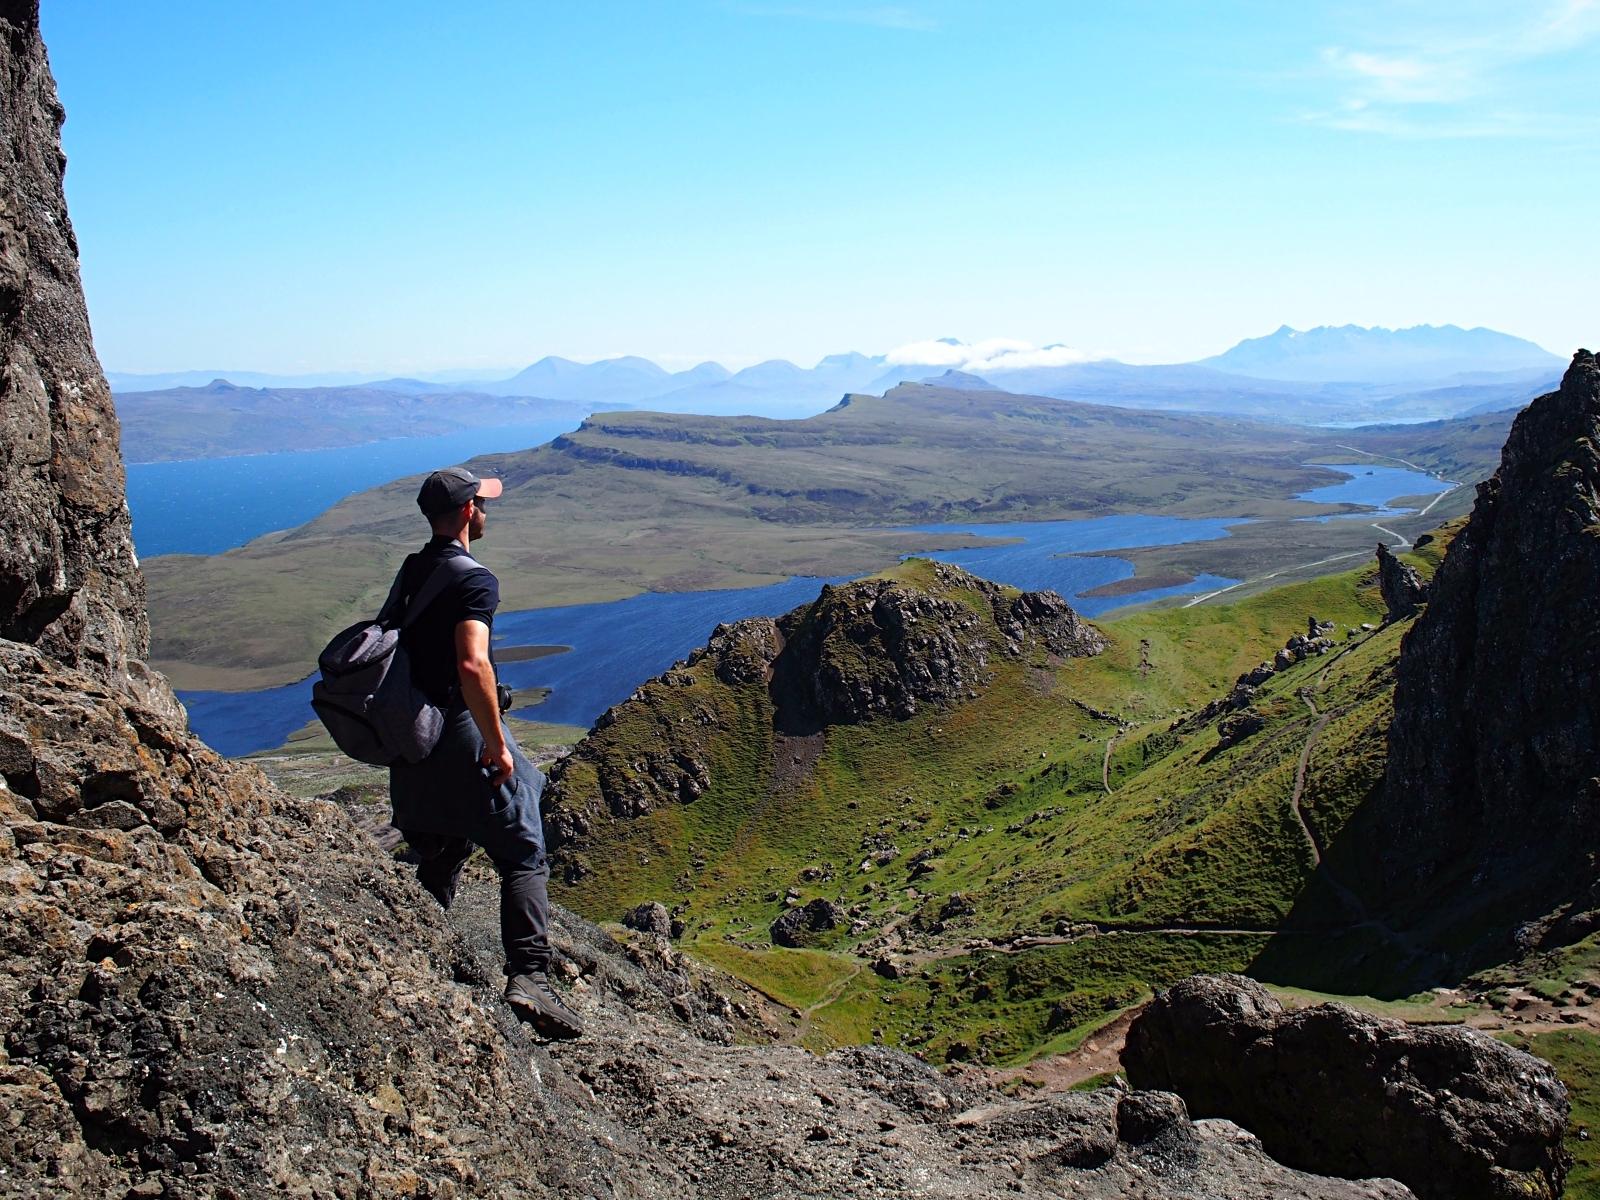 5 Day Skye & Highland Fling - MacBackpackers